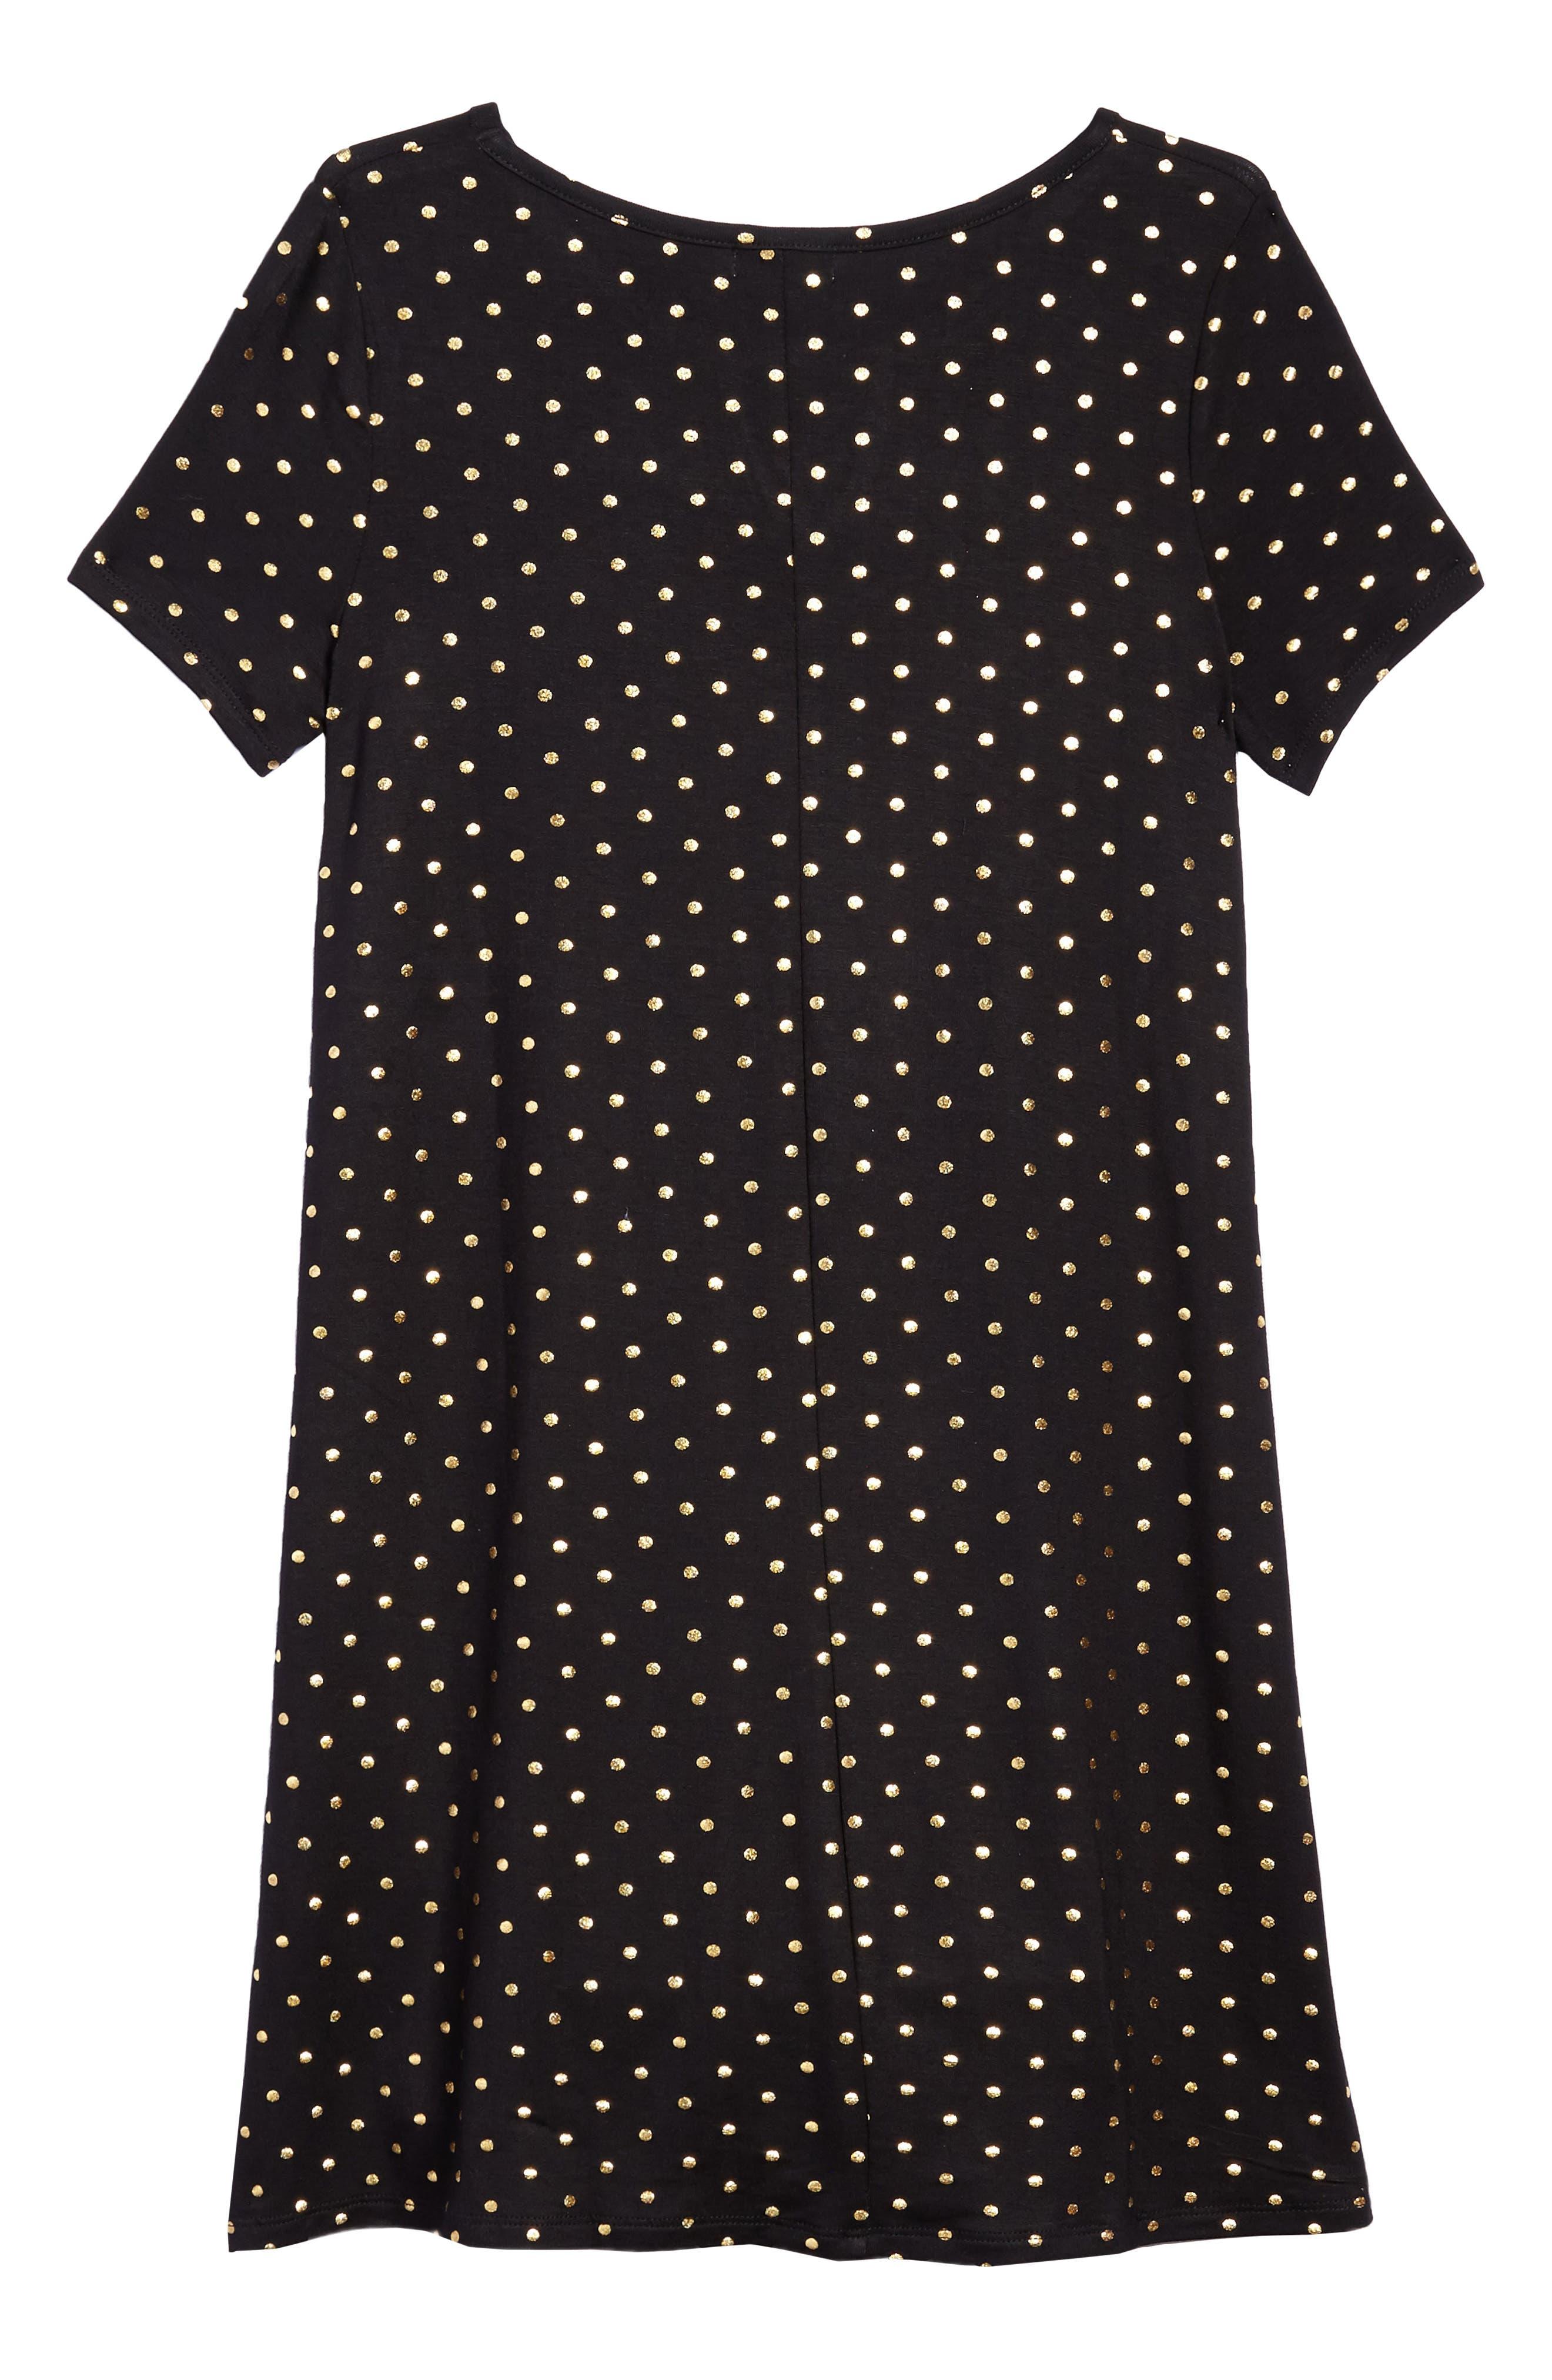 Foil Polka Dot Jersey Dress,                             Alternate thumbnail 2, color,                             Black/ Gold Foil